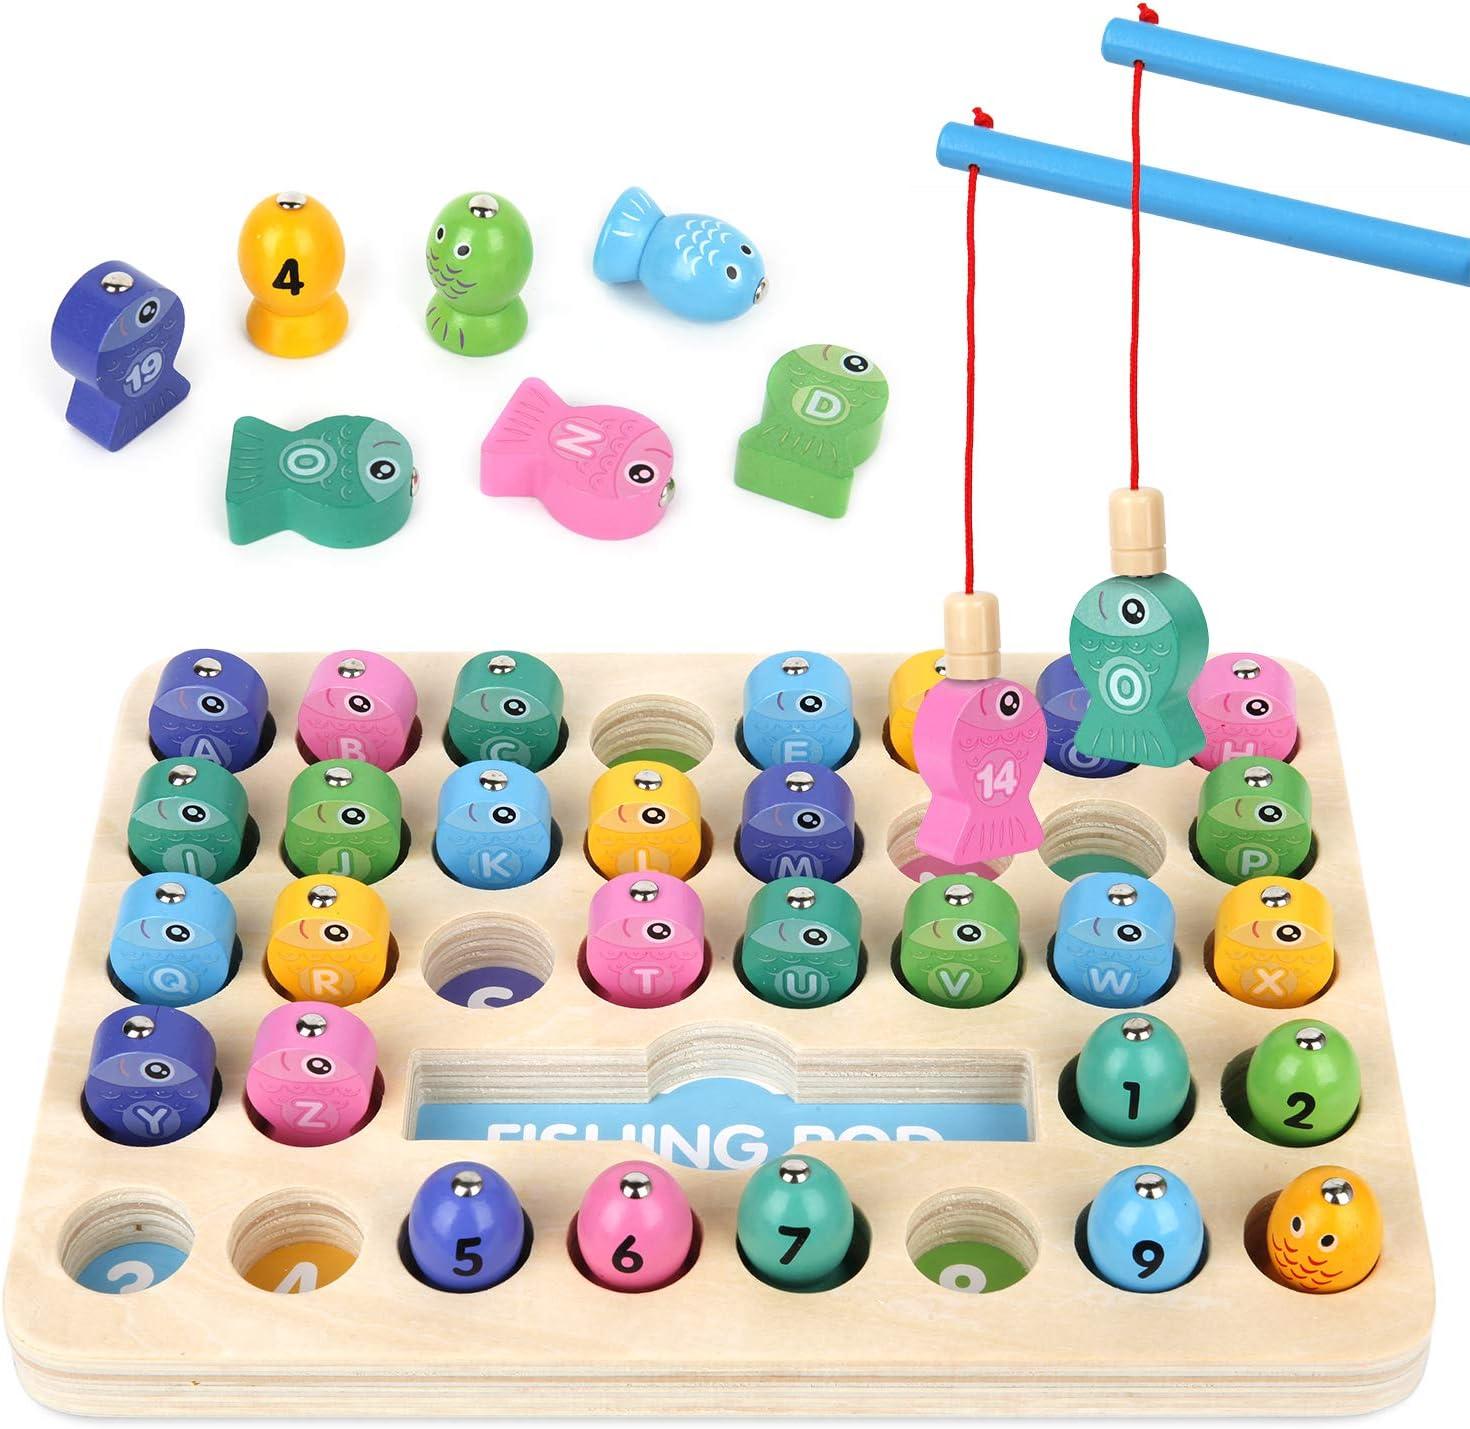 Kids Educational Toys Colorful Cognition Board Montessori Children Wooden